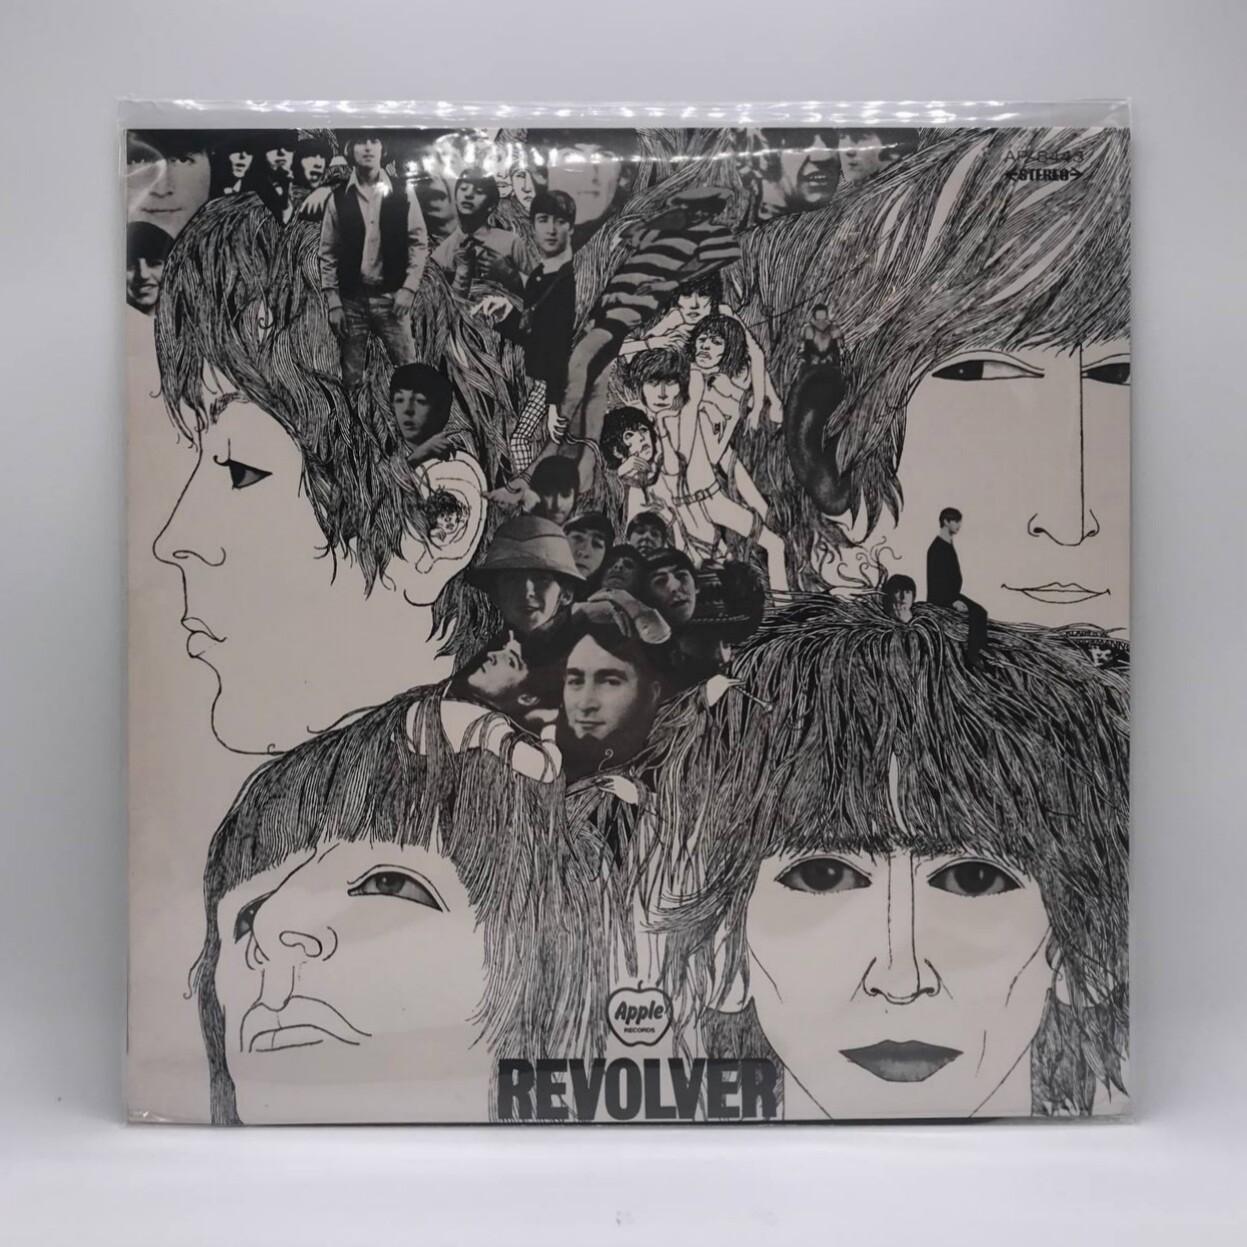 [USED] THE BEATLES -REVOLVER- LP (JAPAN PRESS)